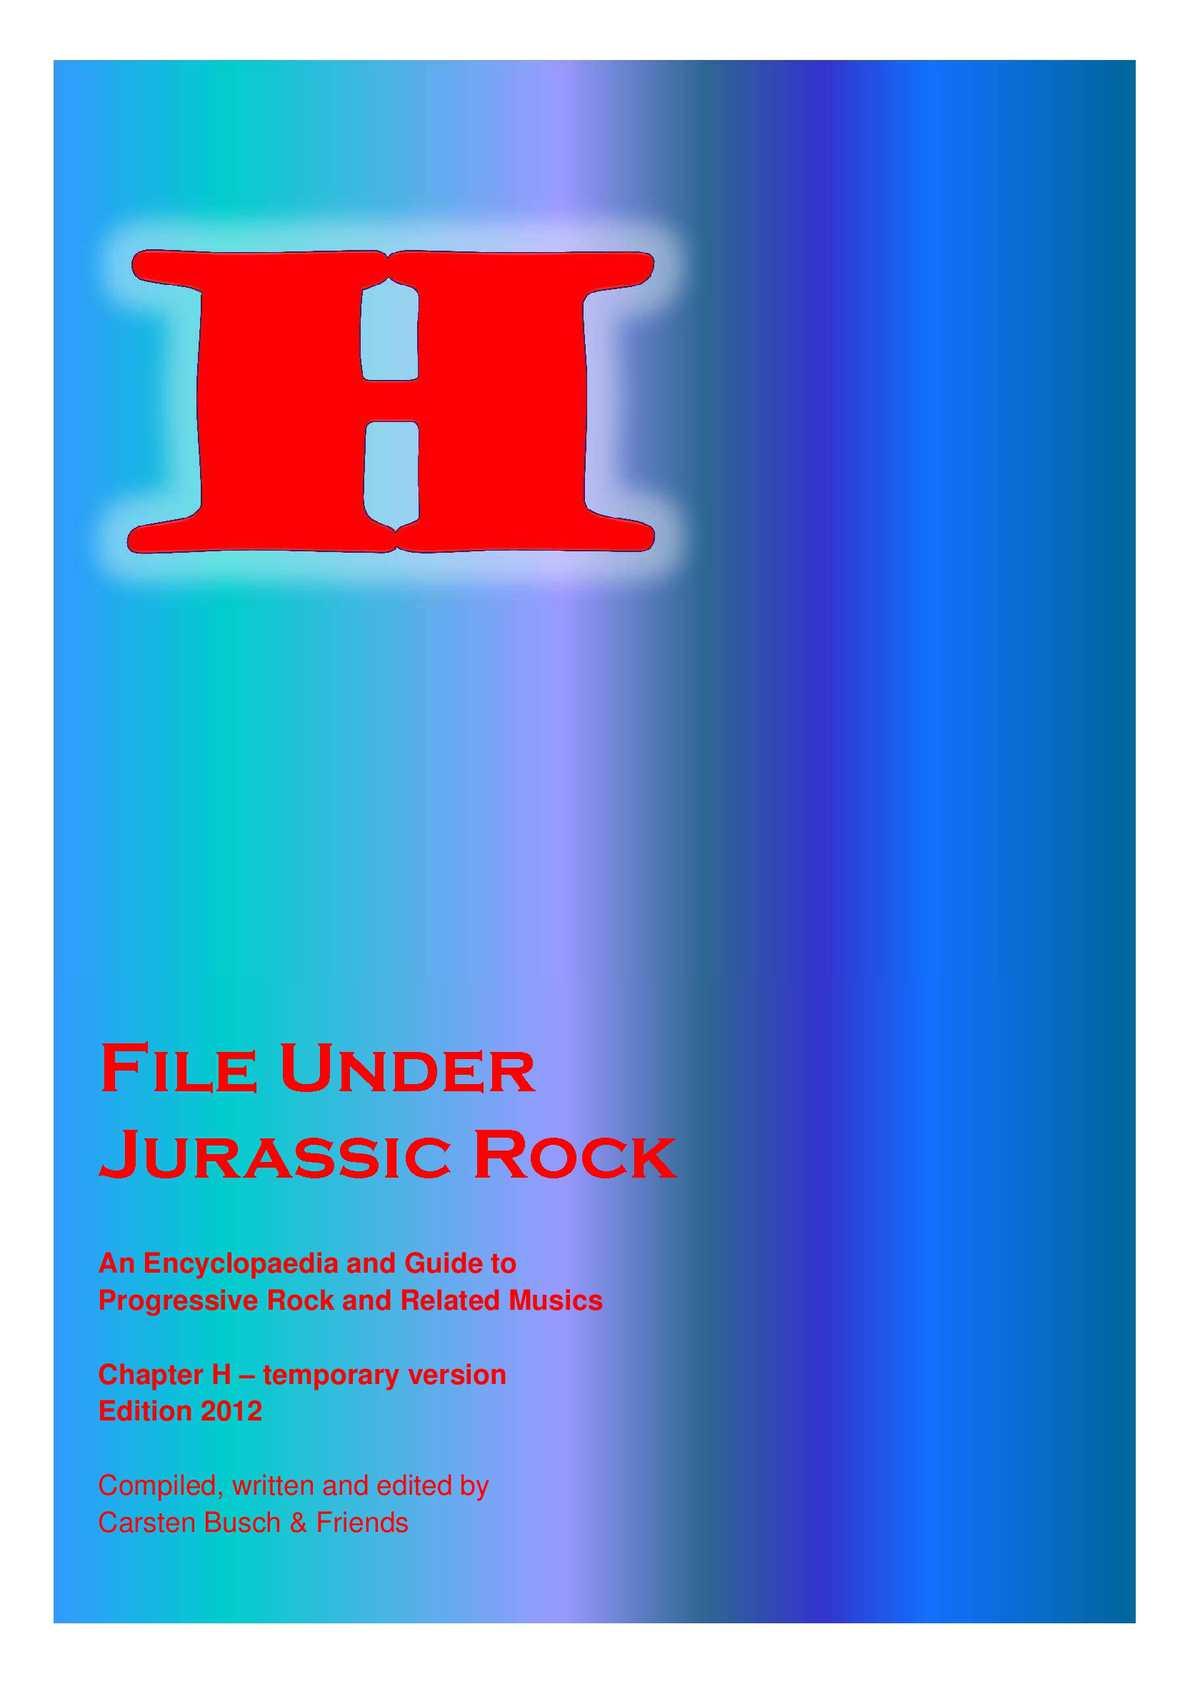 Calaméo - File Under Jurassic Rock - H temporary (2012)